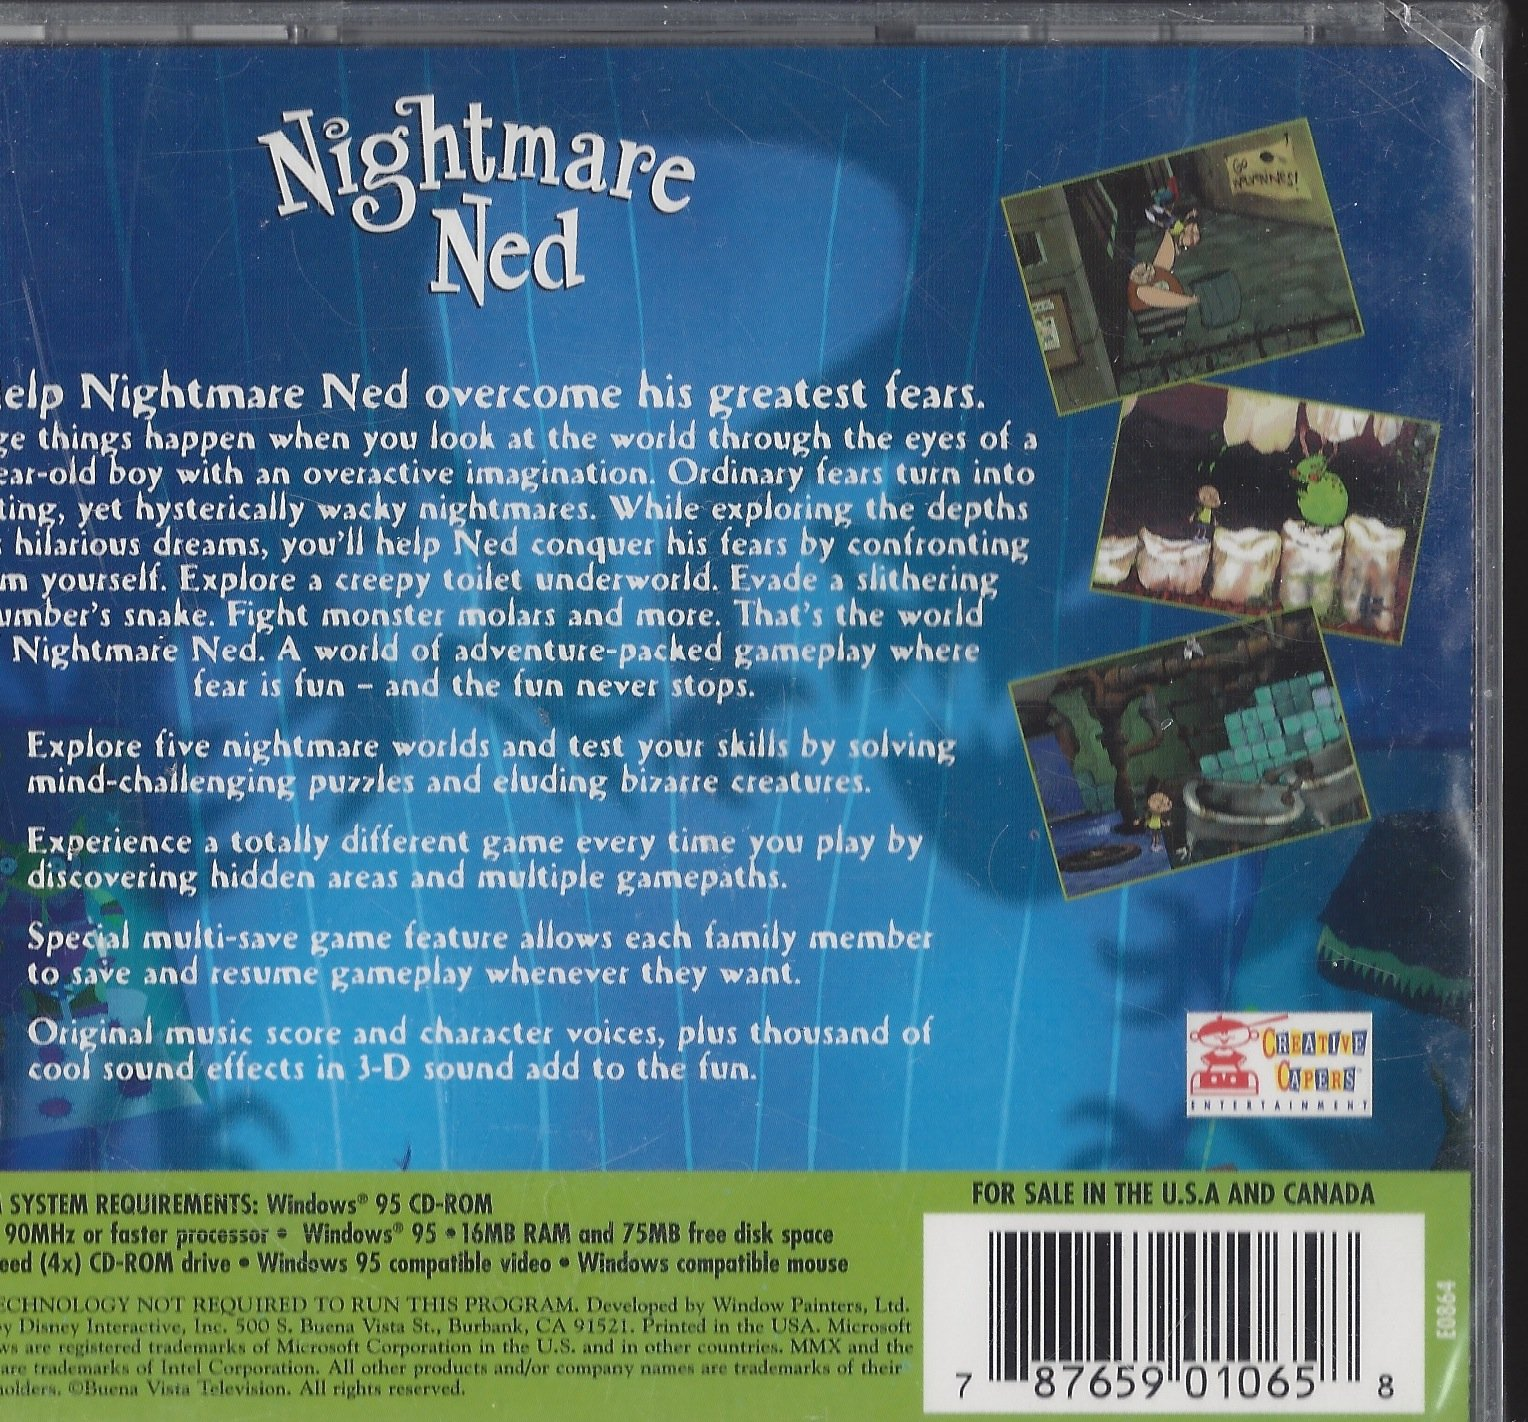 Amazon.com: Nightmare Ned Disney Interactive Intel MMX CD ROM: Video ...